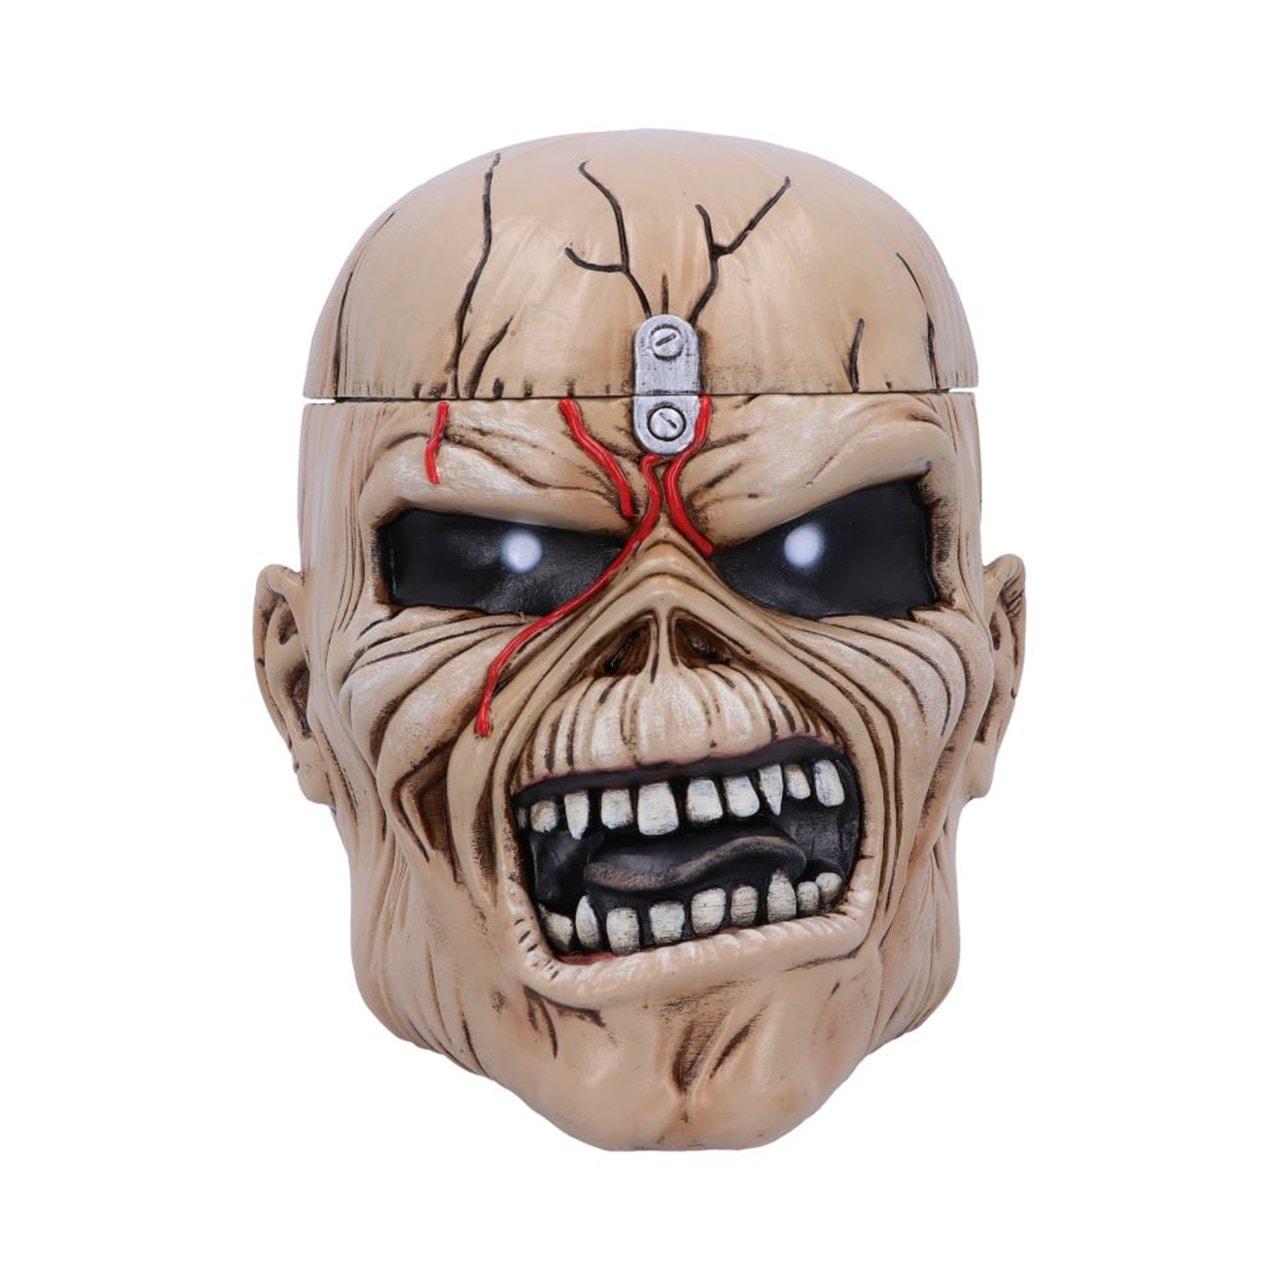 Iron Maiden: The Trooper Storage Box - 2